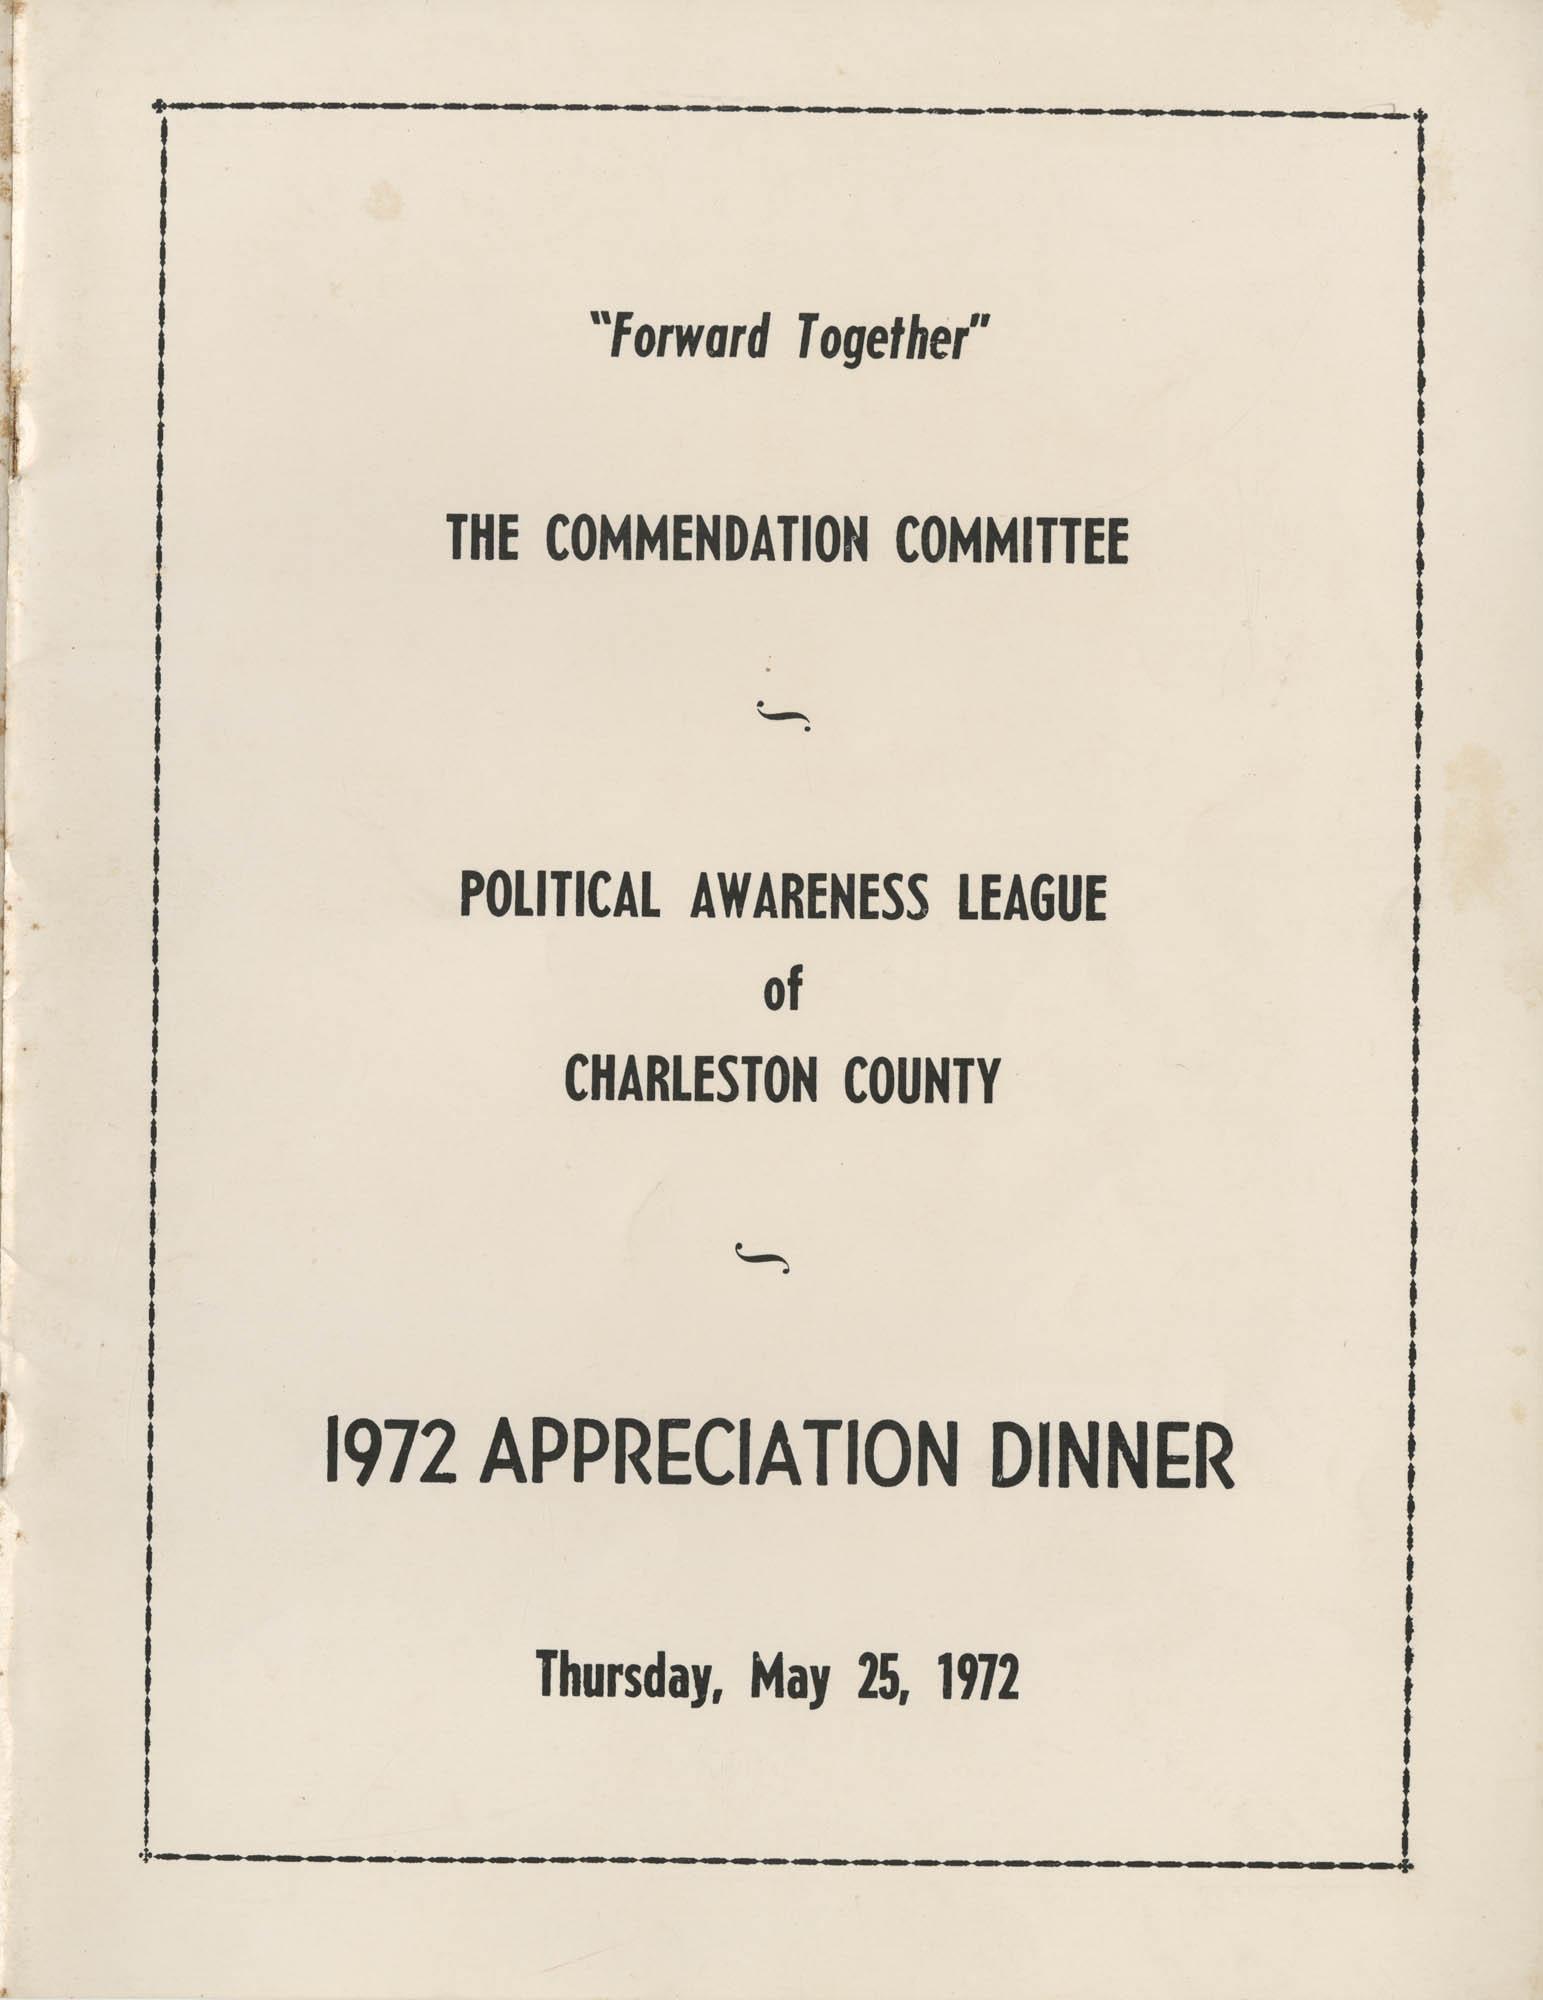 1972 Appreciation Dinner Program, Cover